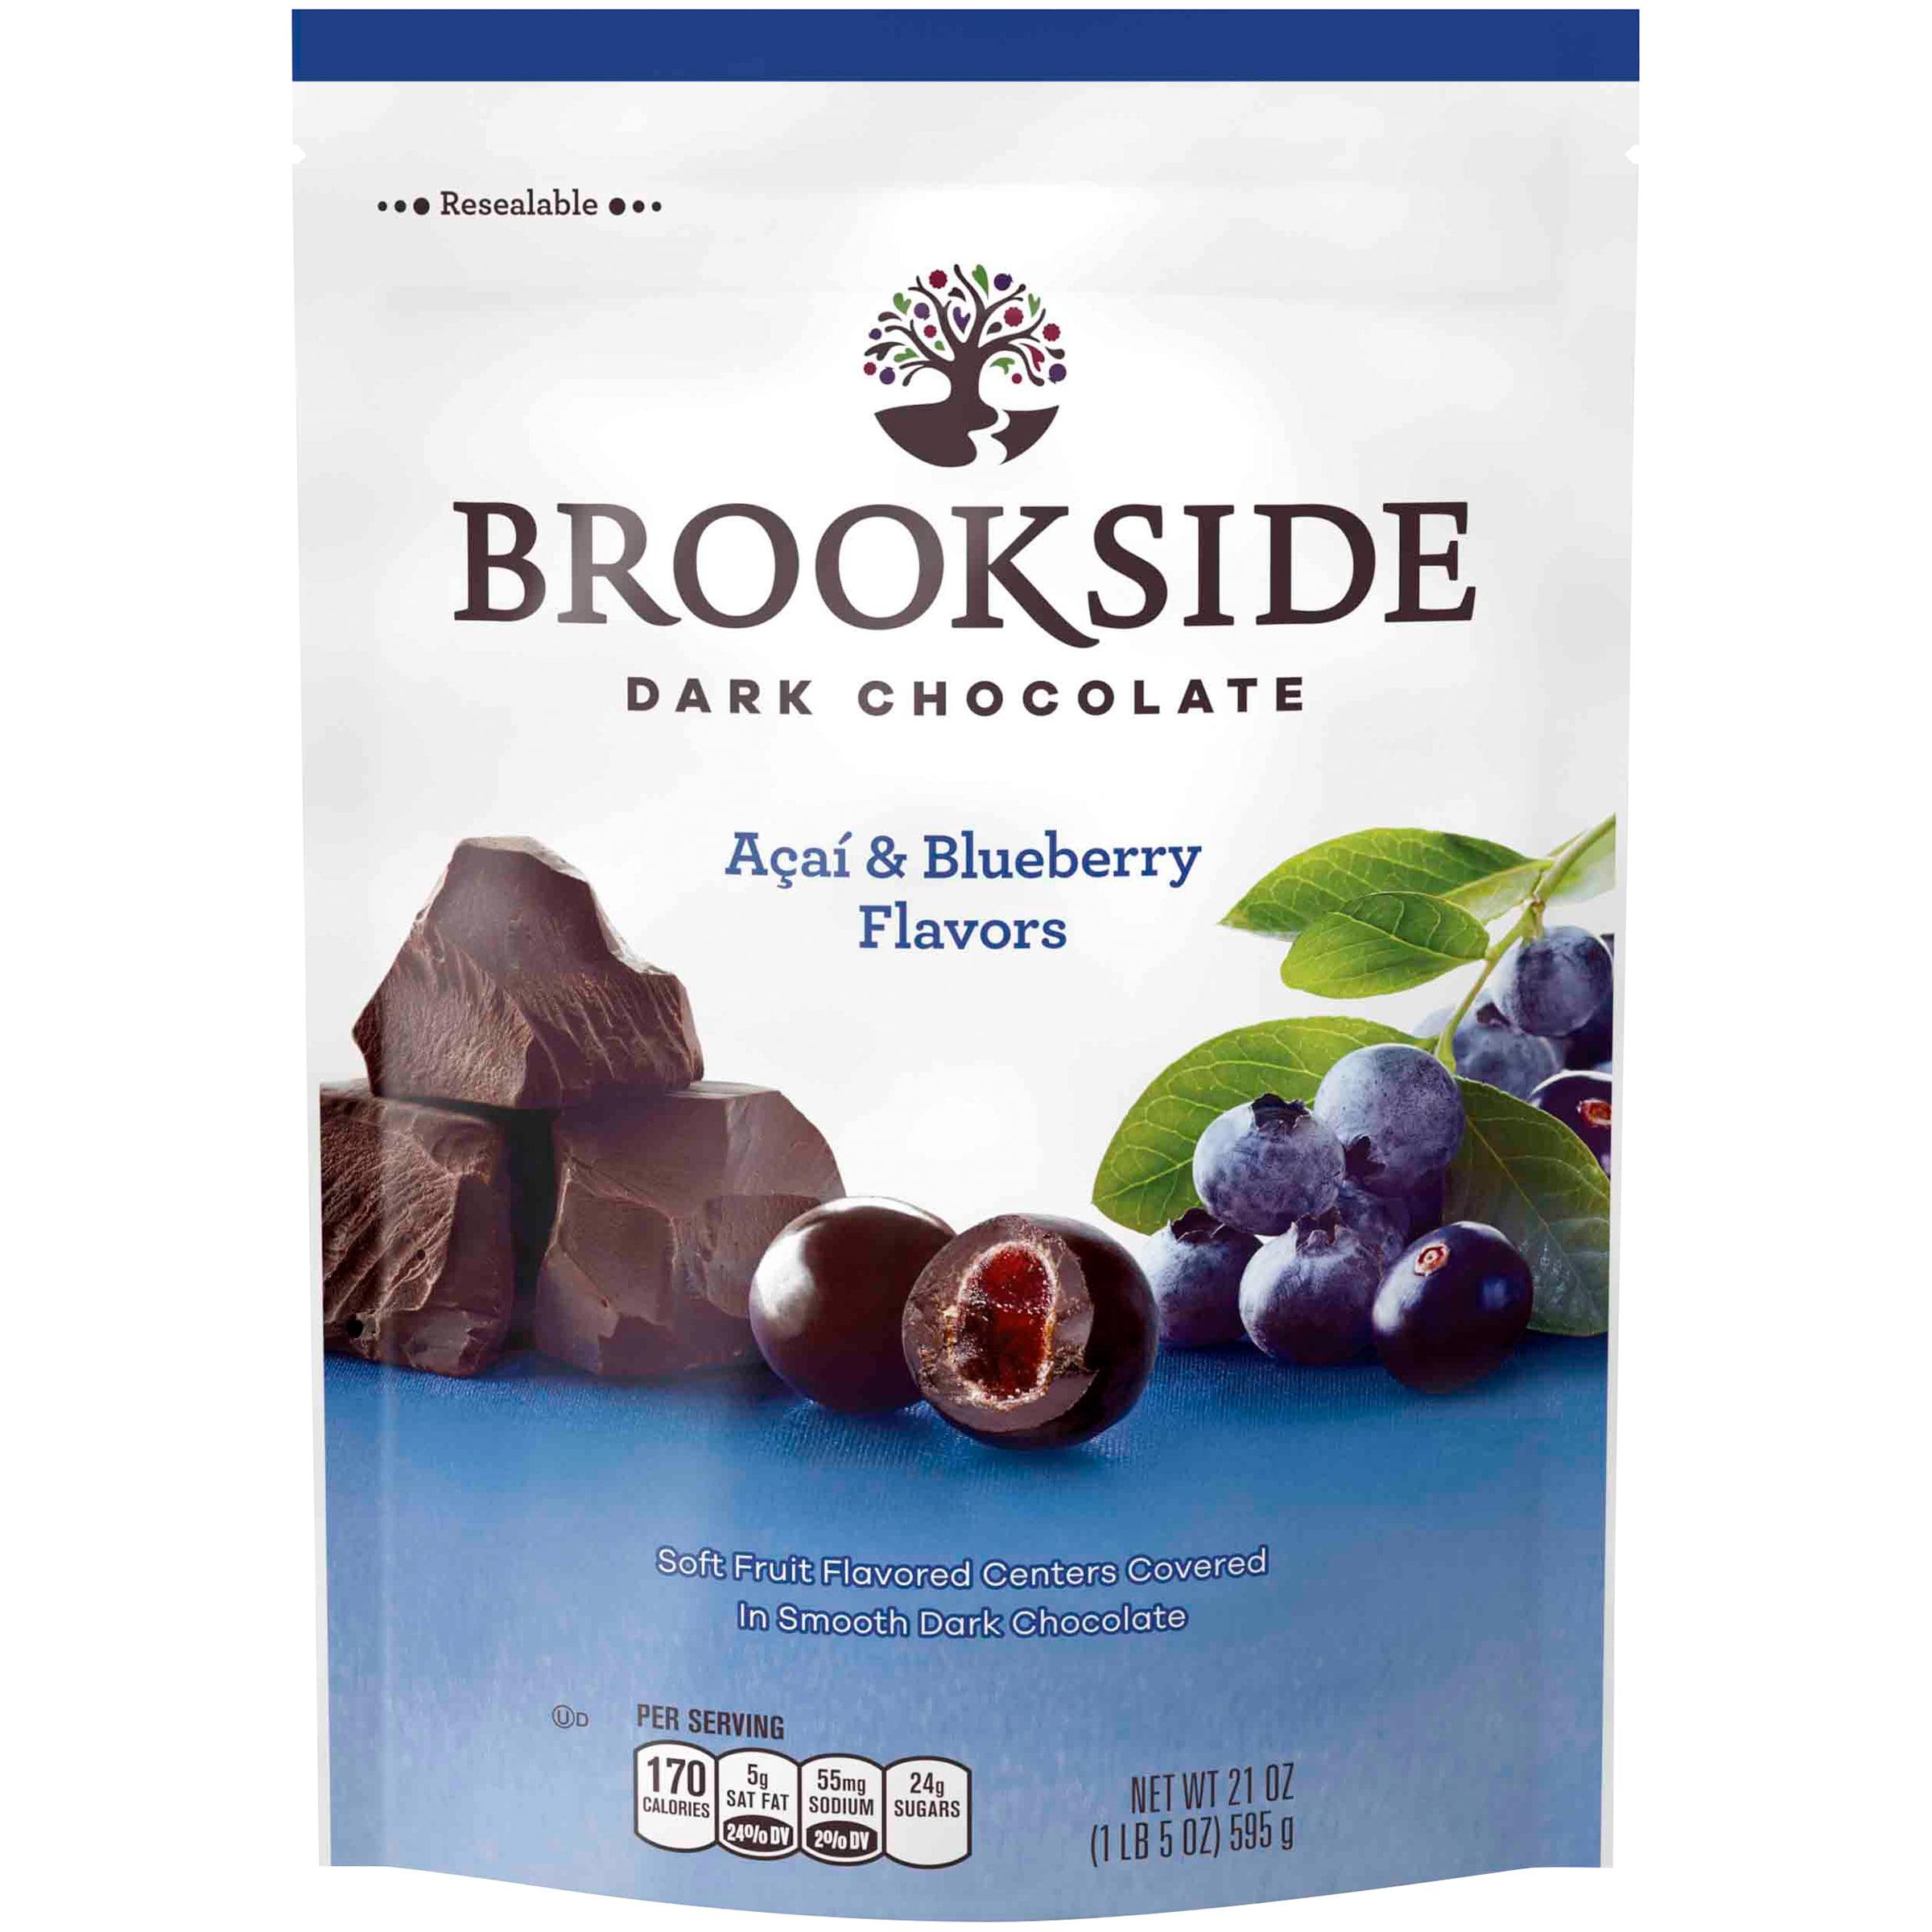 Brookside, Acai & Blueberry Dark Chocolate Candy, 21 Oz.